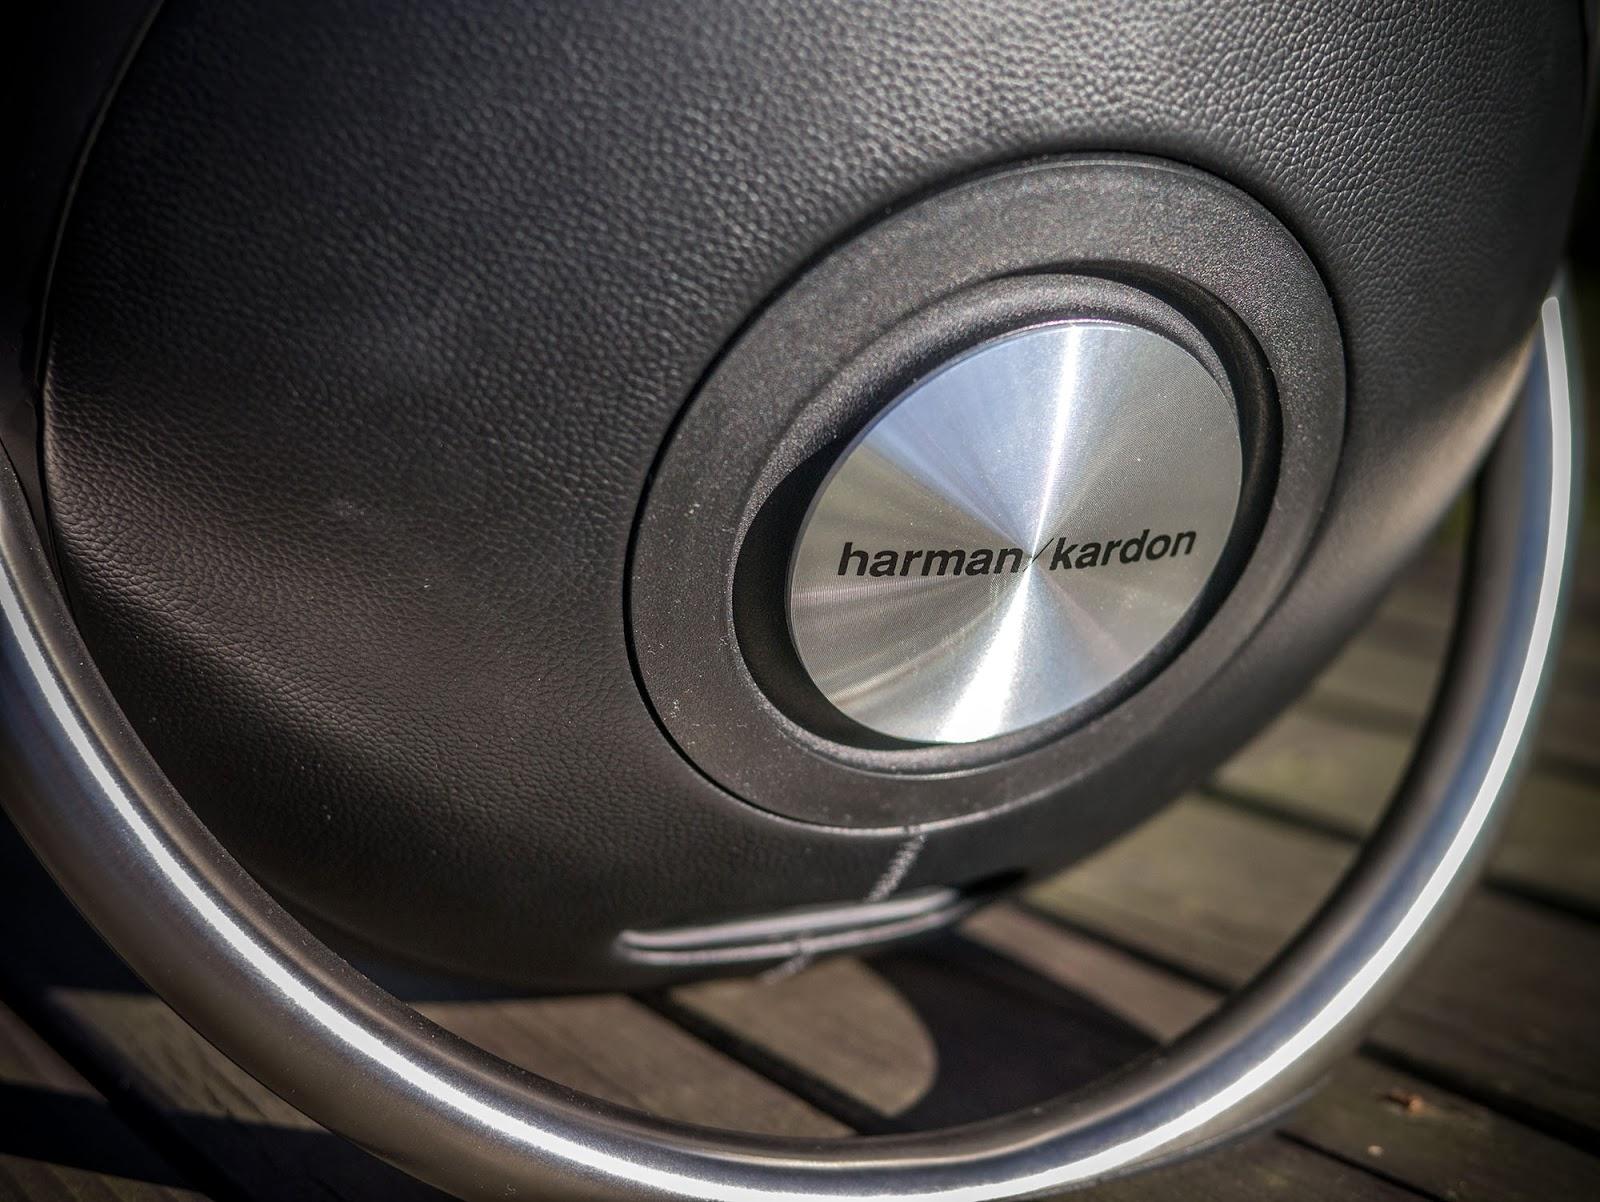 loa, bluetooth, tintucaudio, passive radiator, harman/kardon